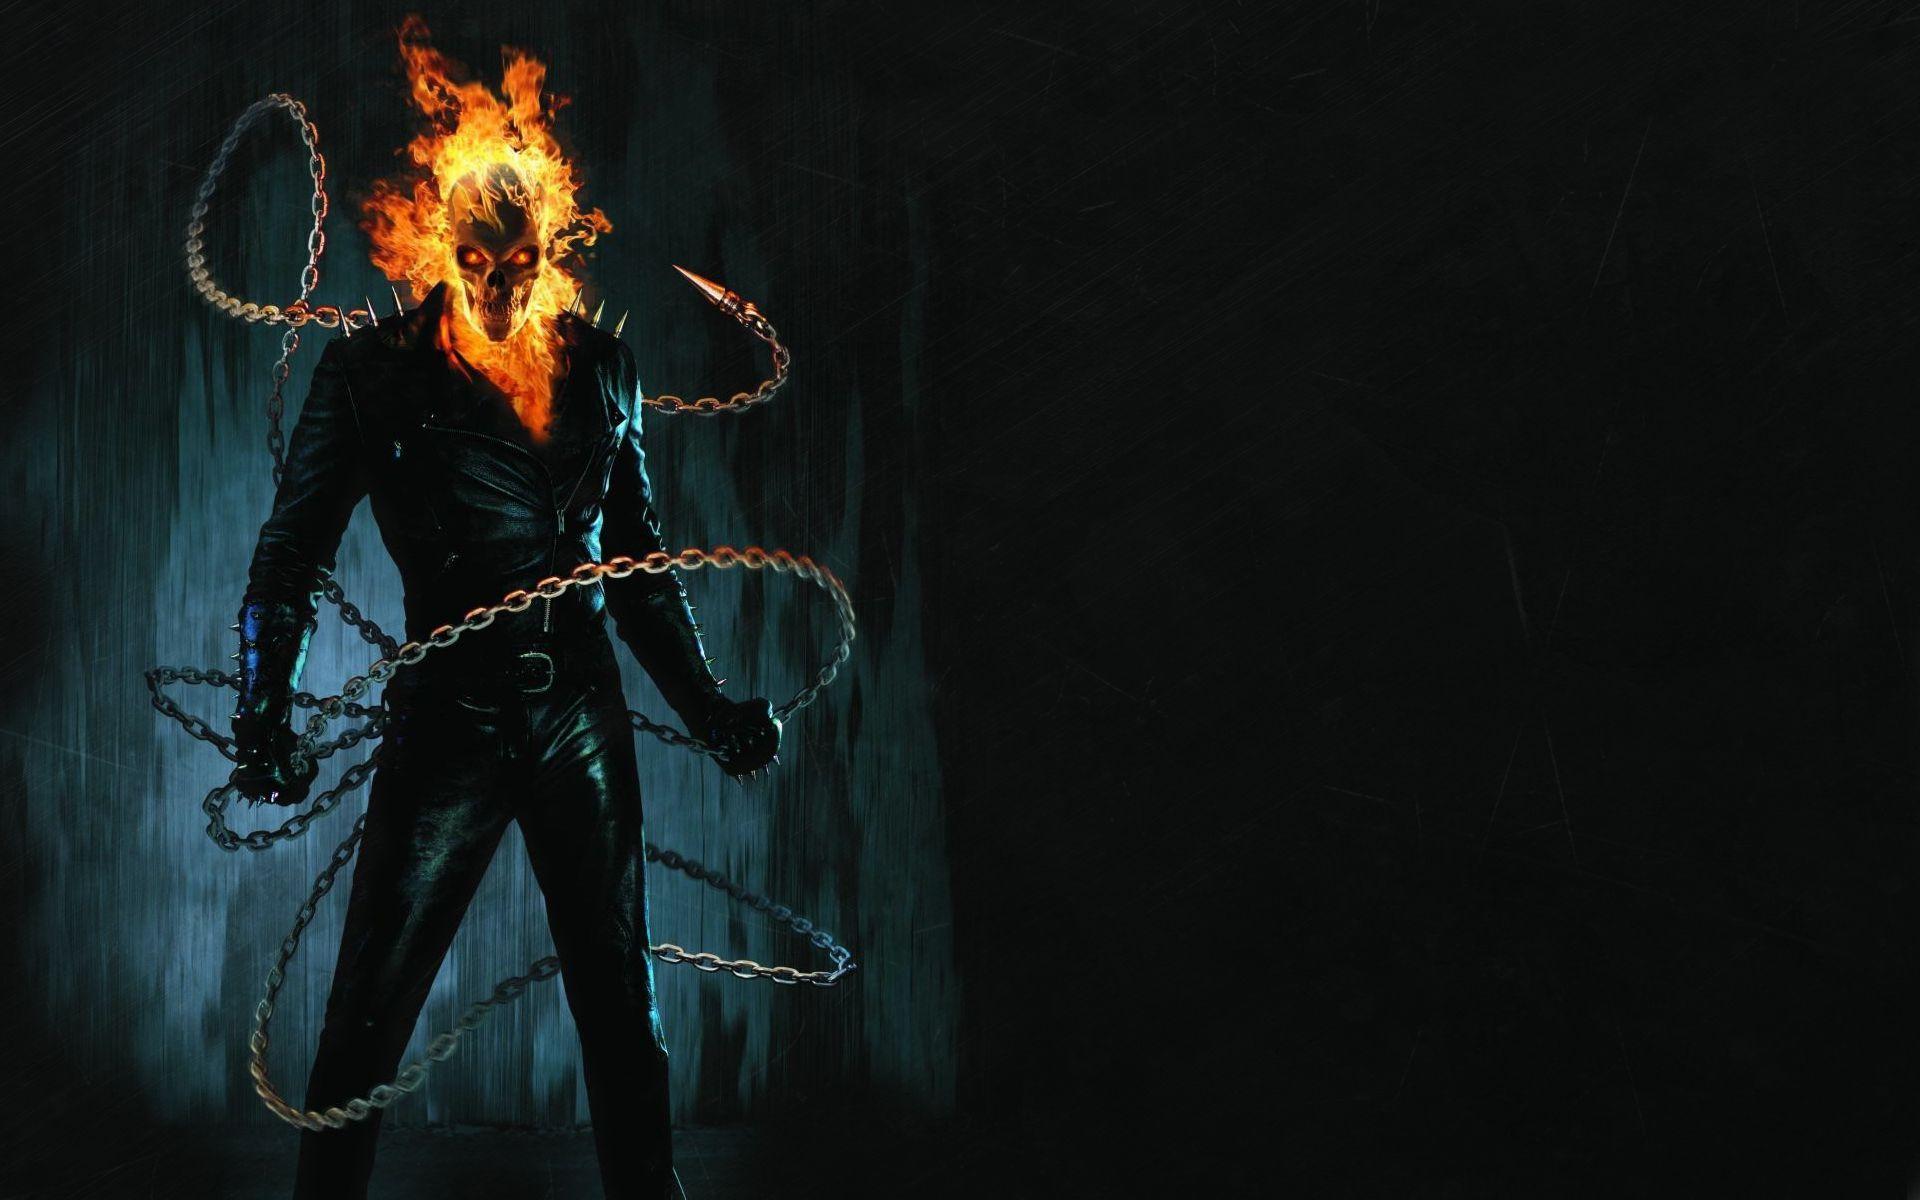 ghost rider movie hd wallpaper 1920x1200 10238 ghost rider 1920x1200